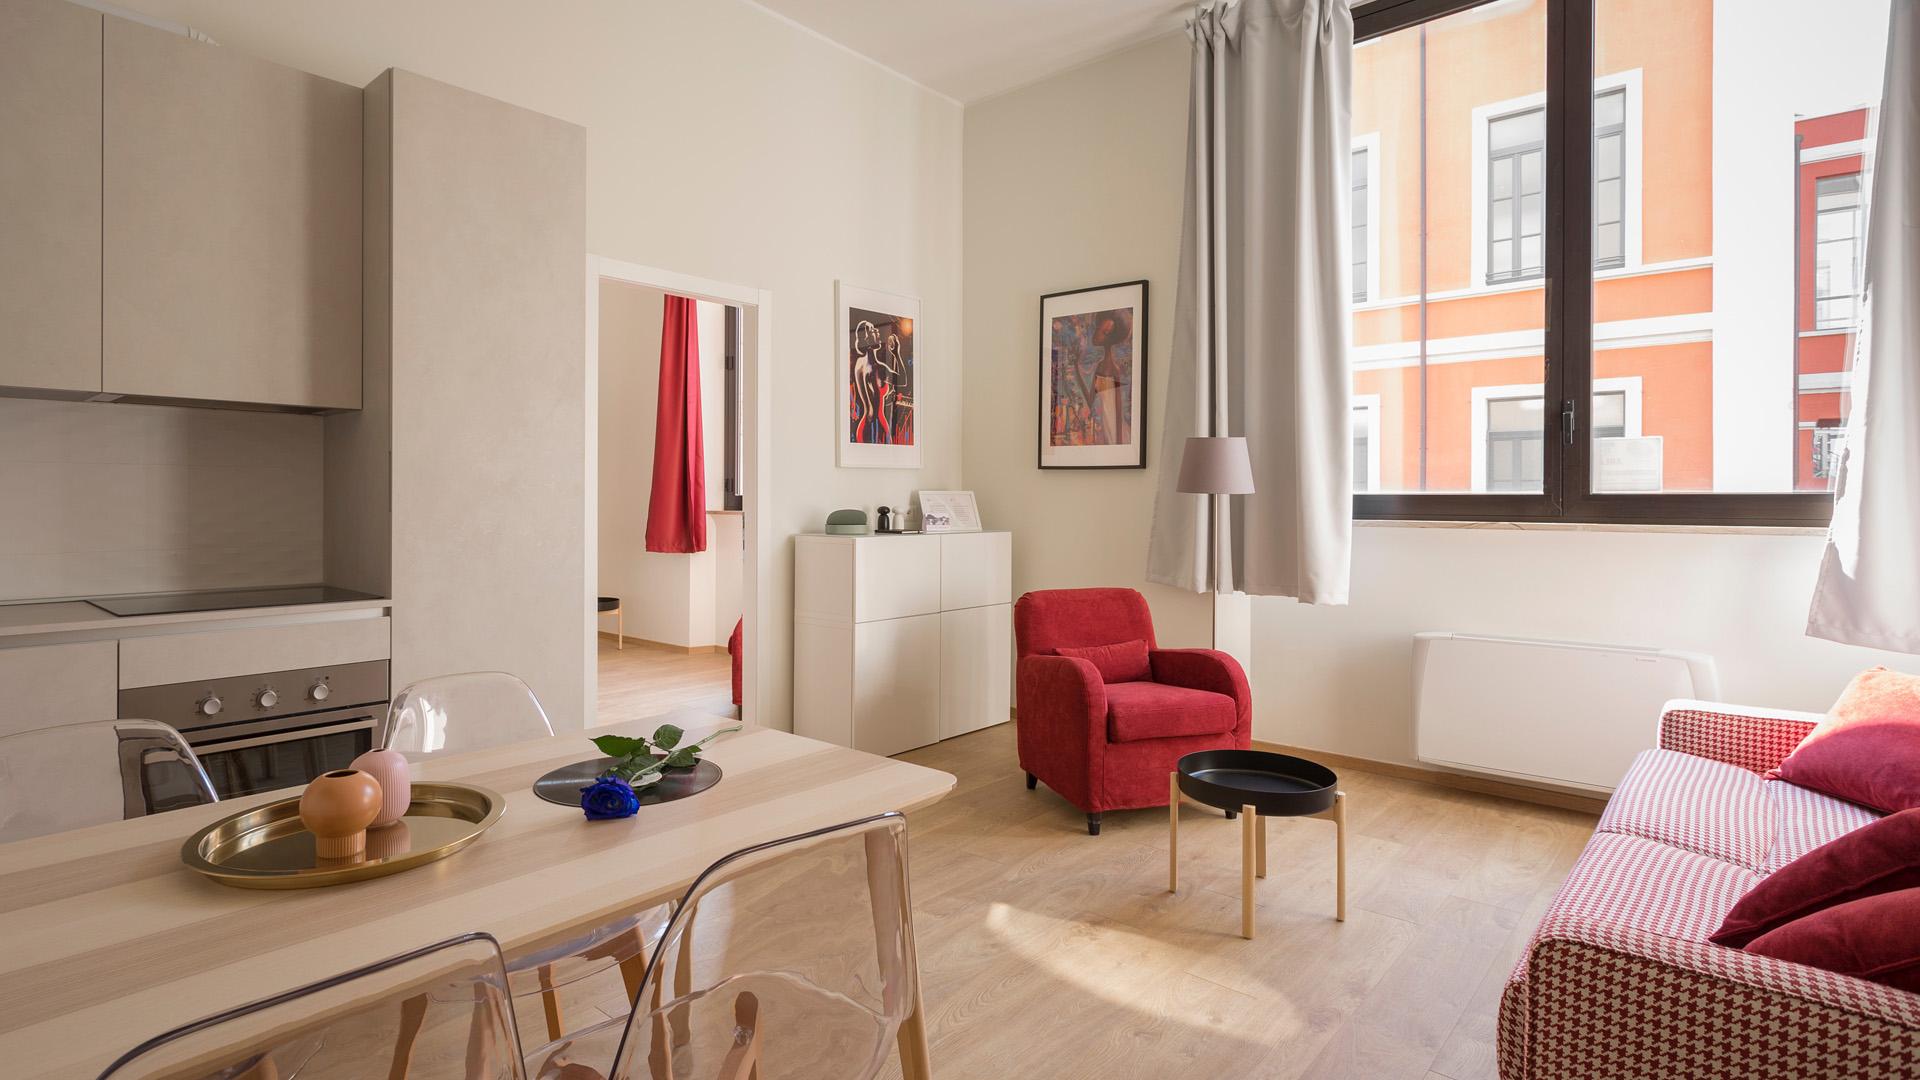 Inmobiliarias Estepona real estate